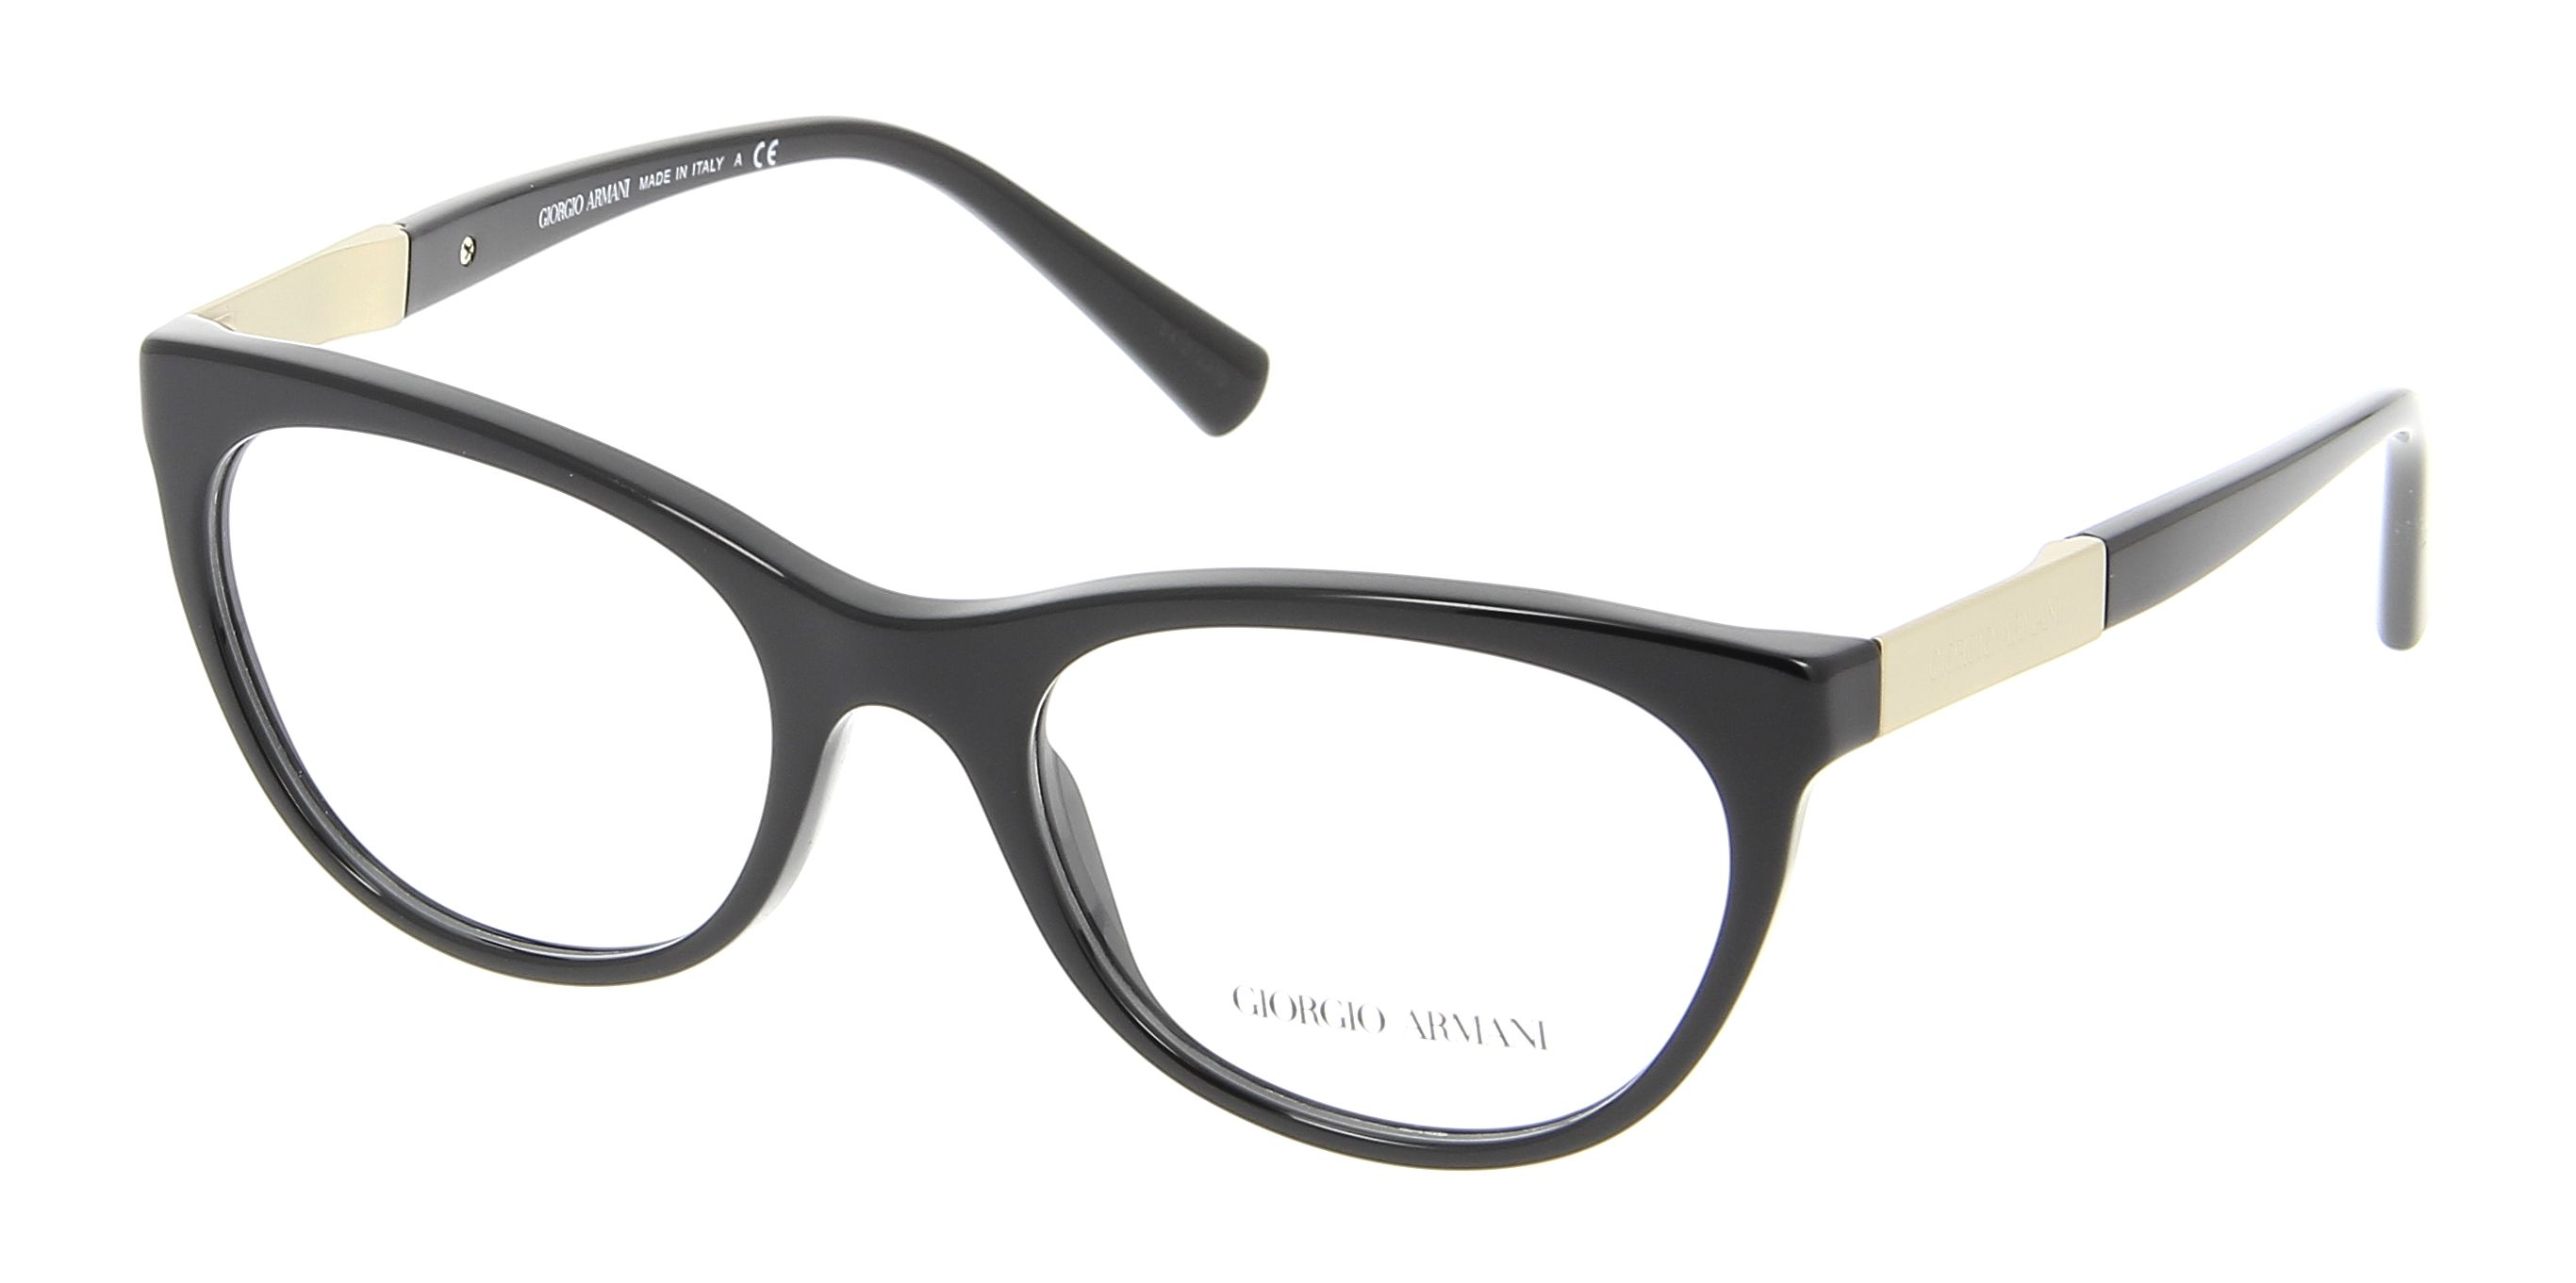 Eyeglasses GIORGIO ARMANI AR 7082 5017 54/19 Woman Noir square ...